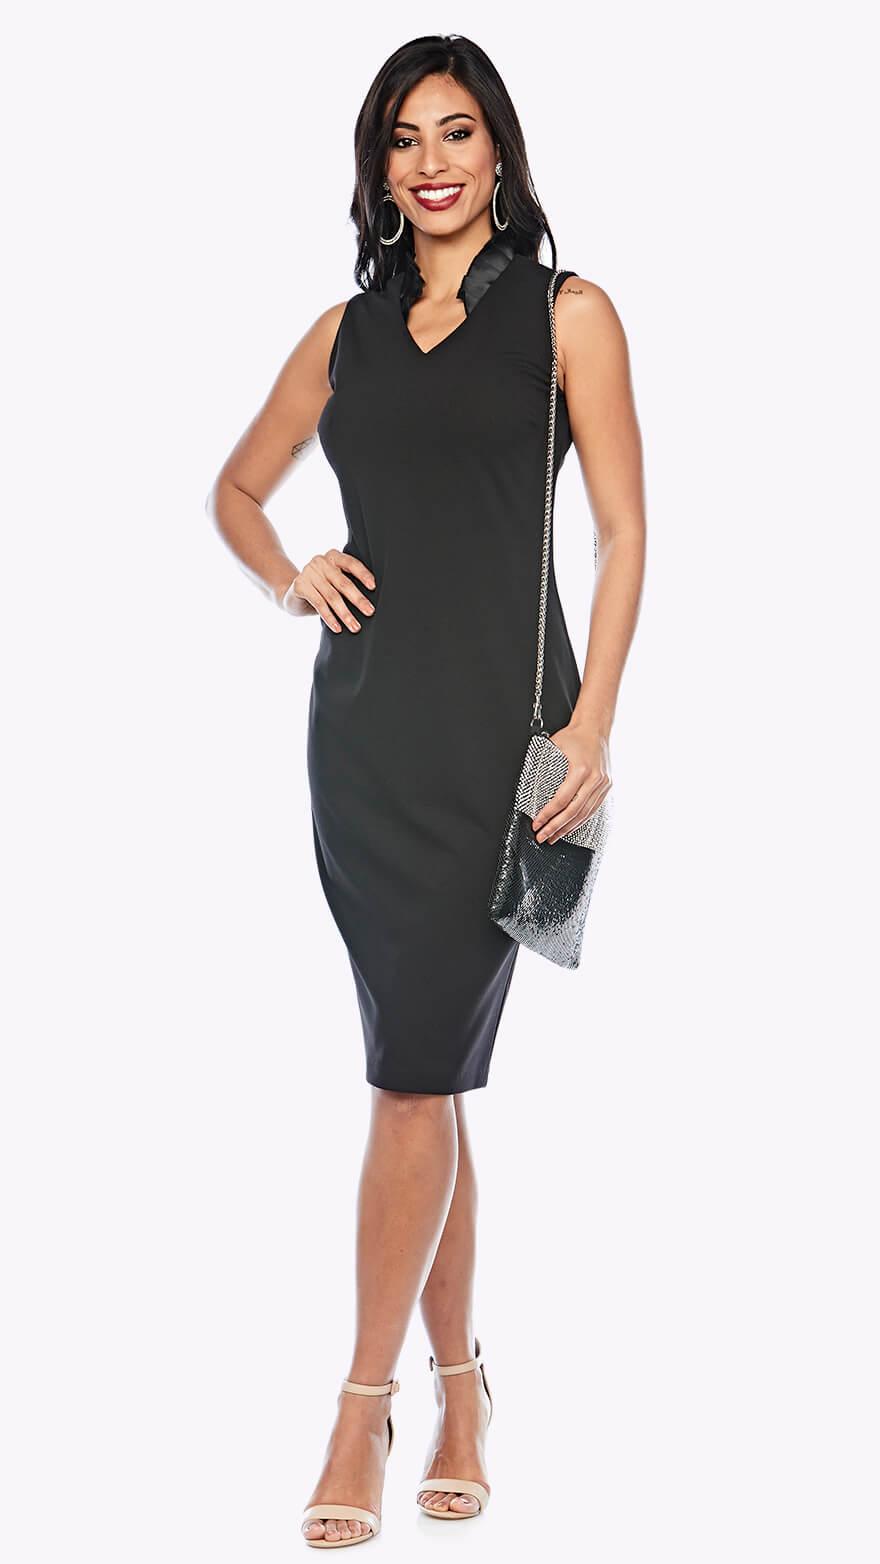 Z0298 V neck cocktail length dress with contrasting satin collar detail